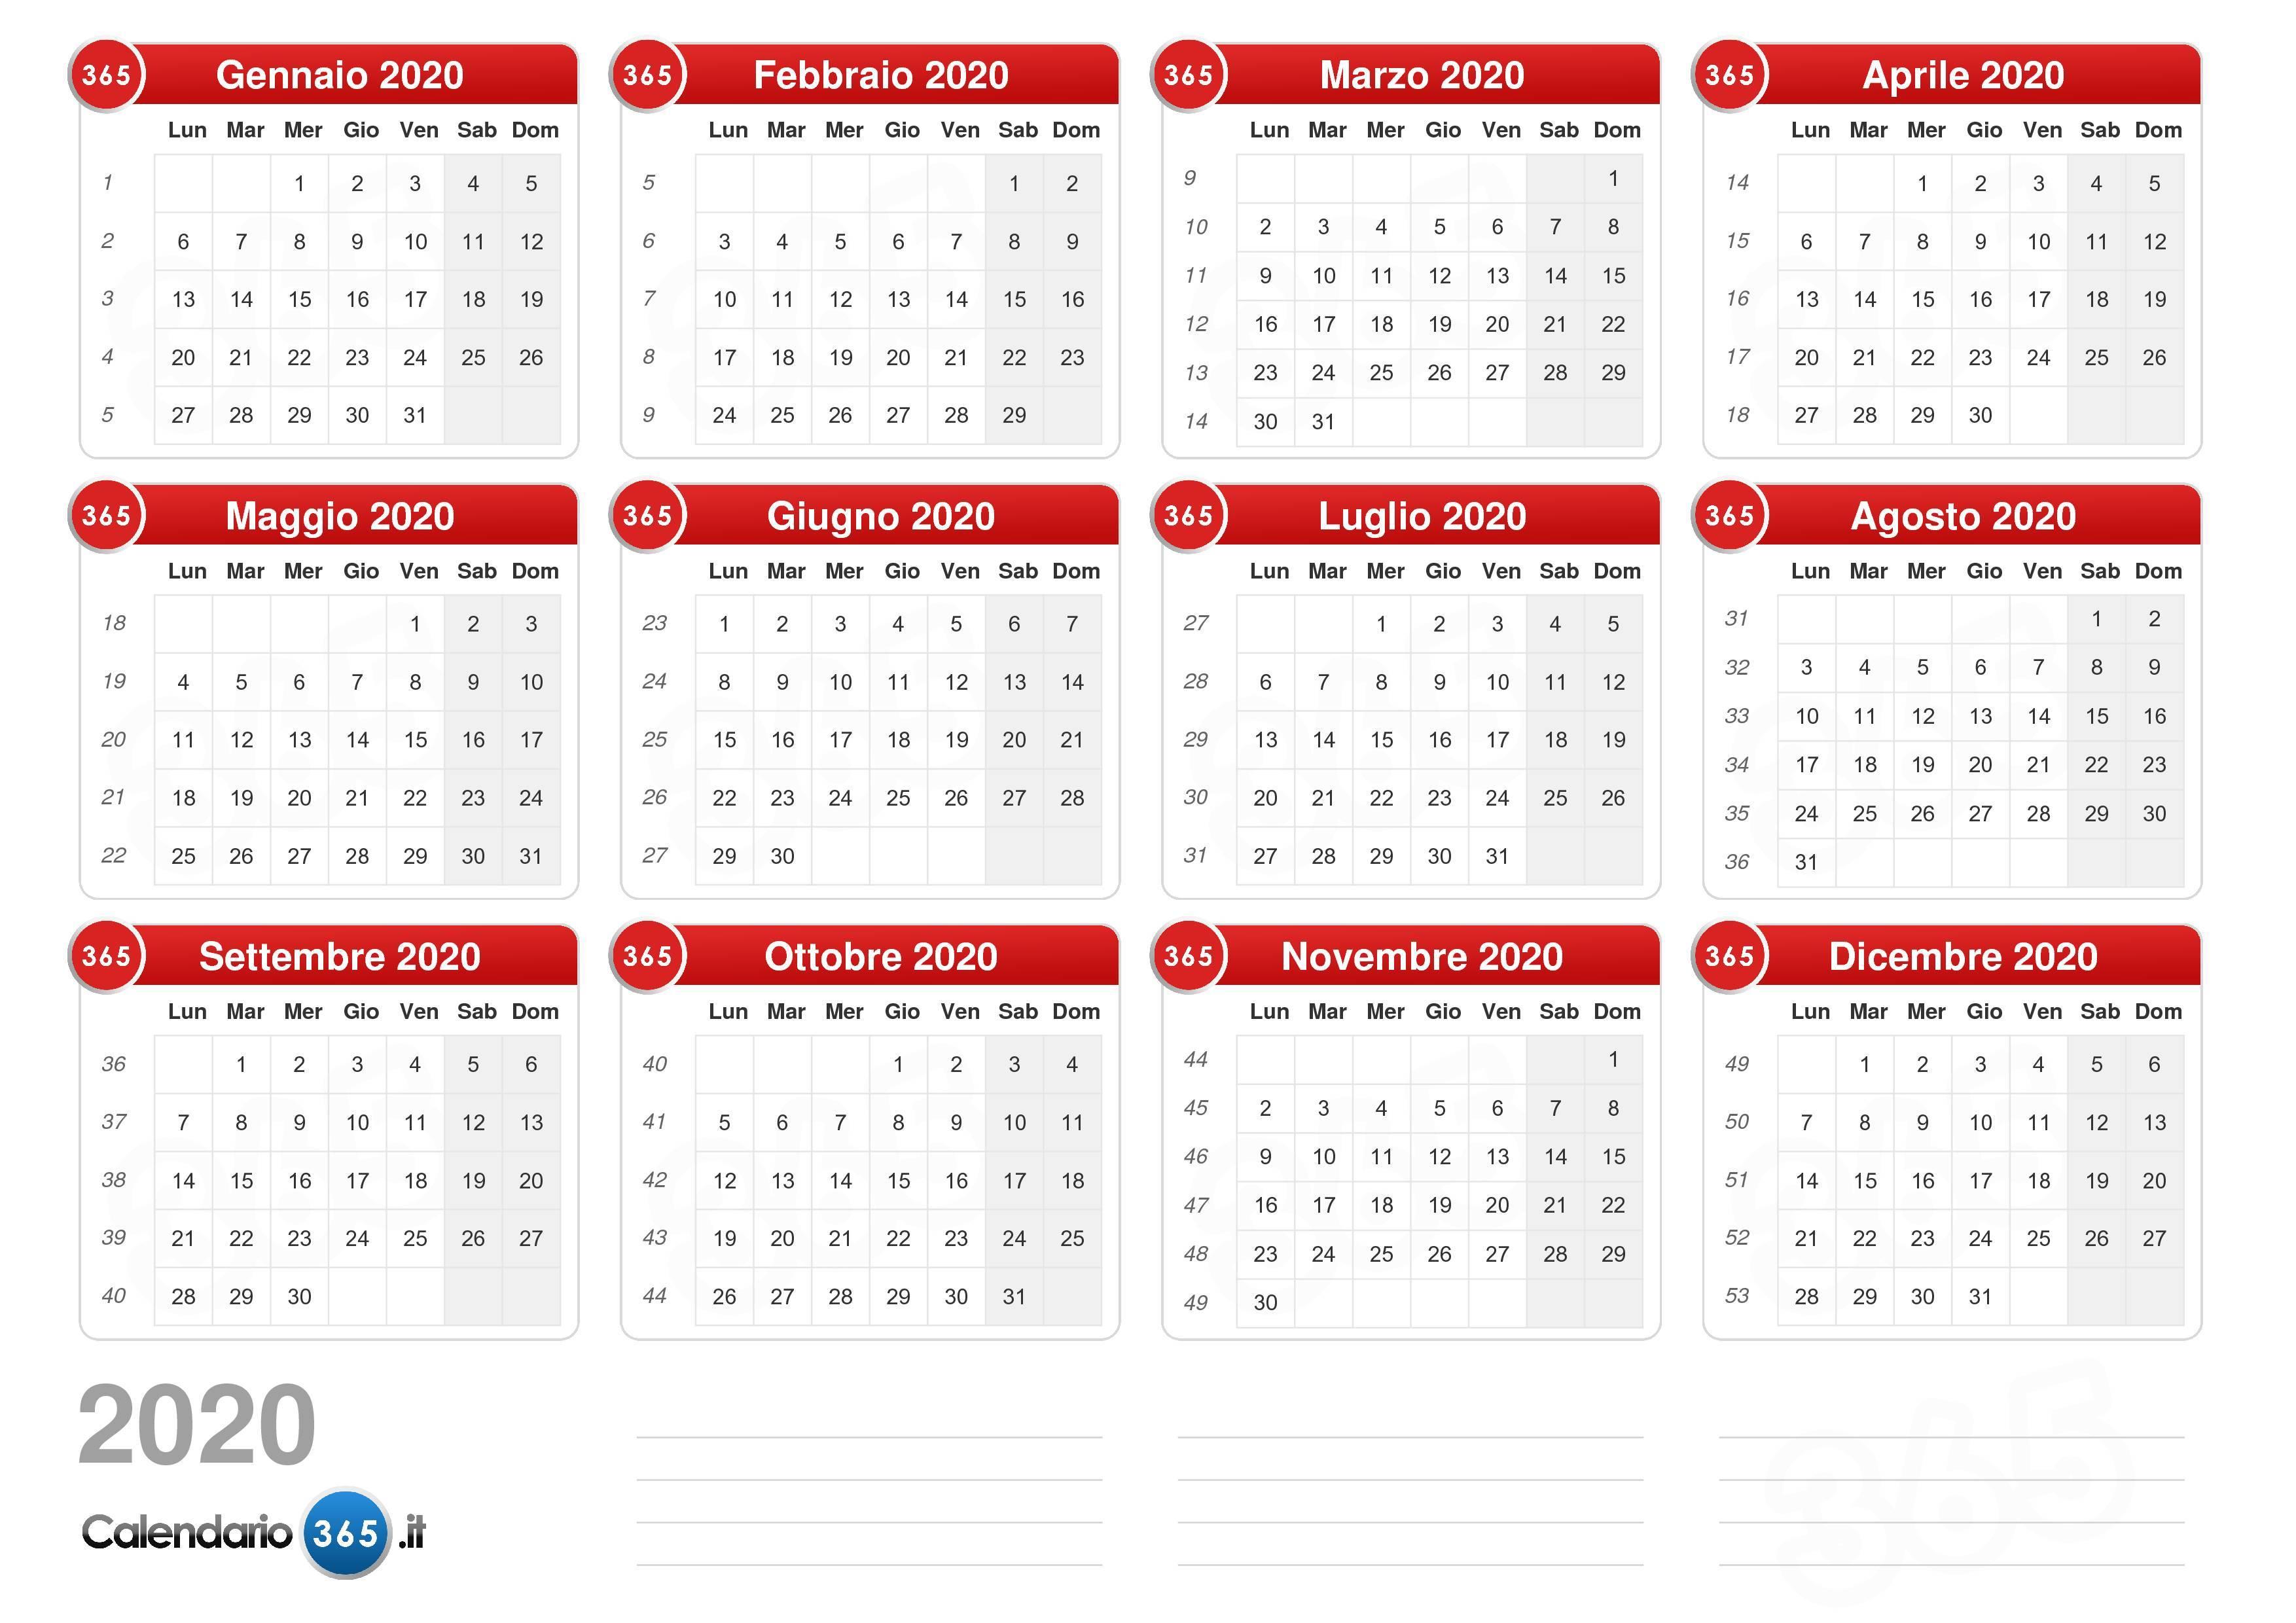 Calendario Fotografico 2020.Foto Calendario 2020 Calendario 2020